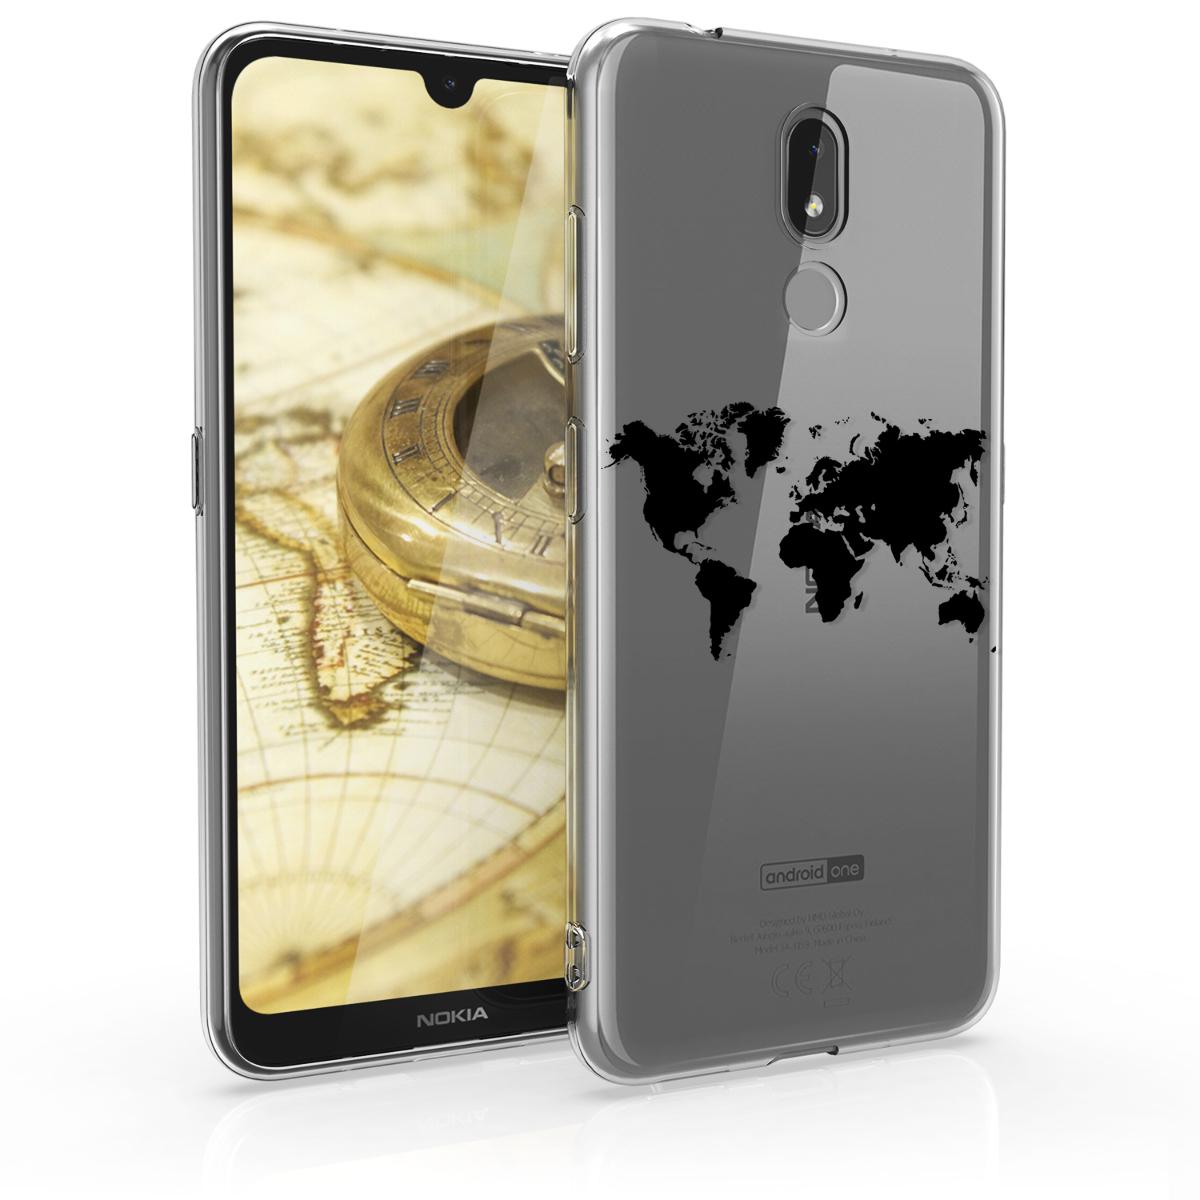 KW Θήκη Σιλικόνης Nokia 3.2 - Crystal Clear - Black / Transparent (48015.06)